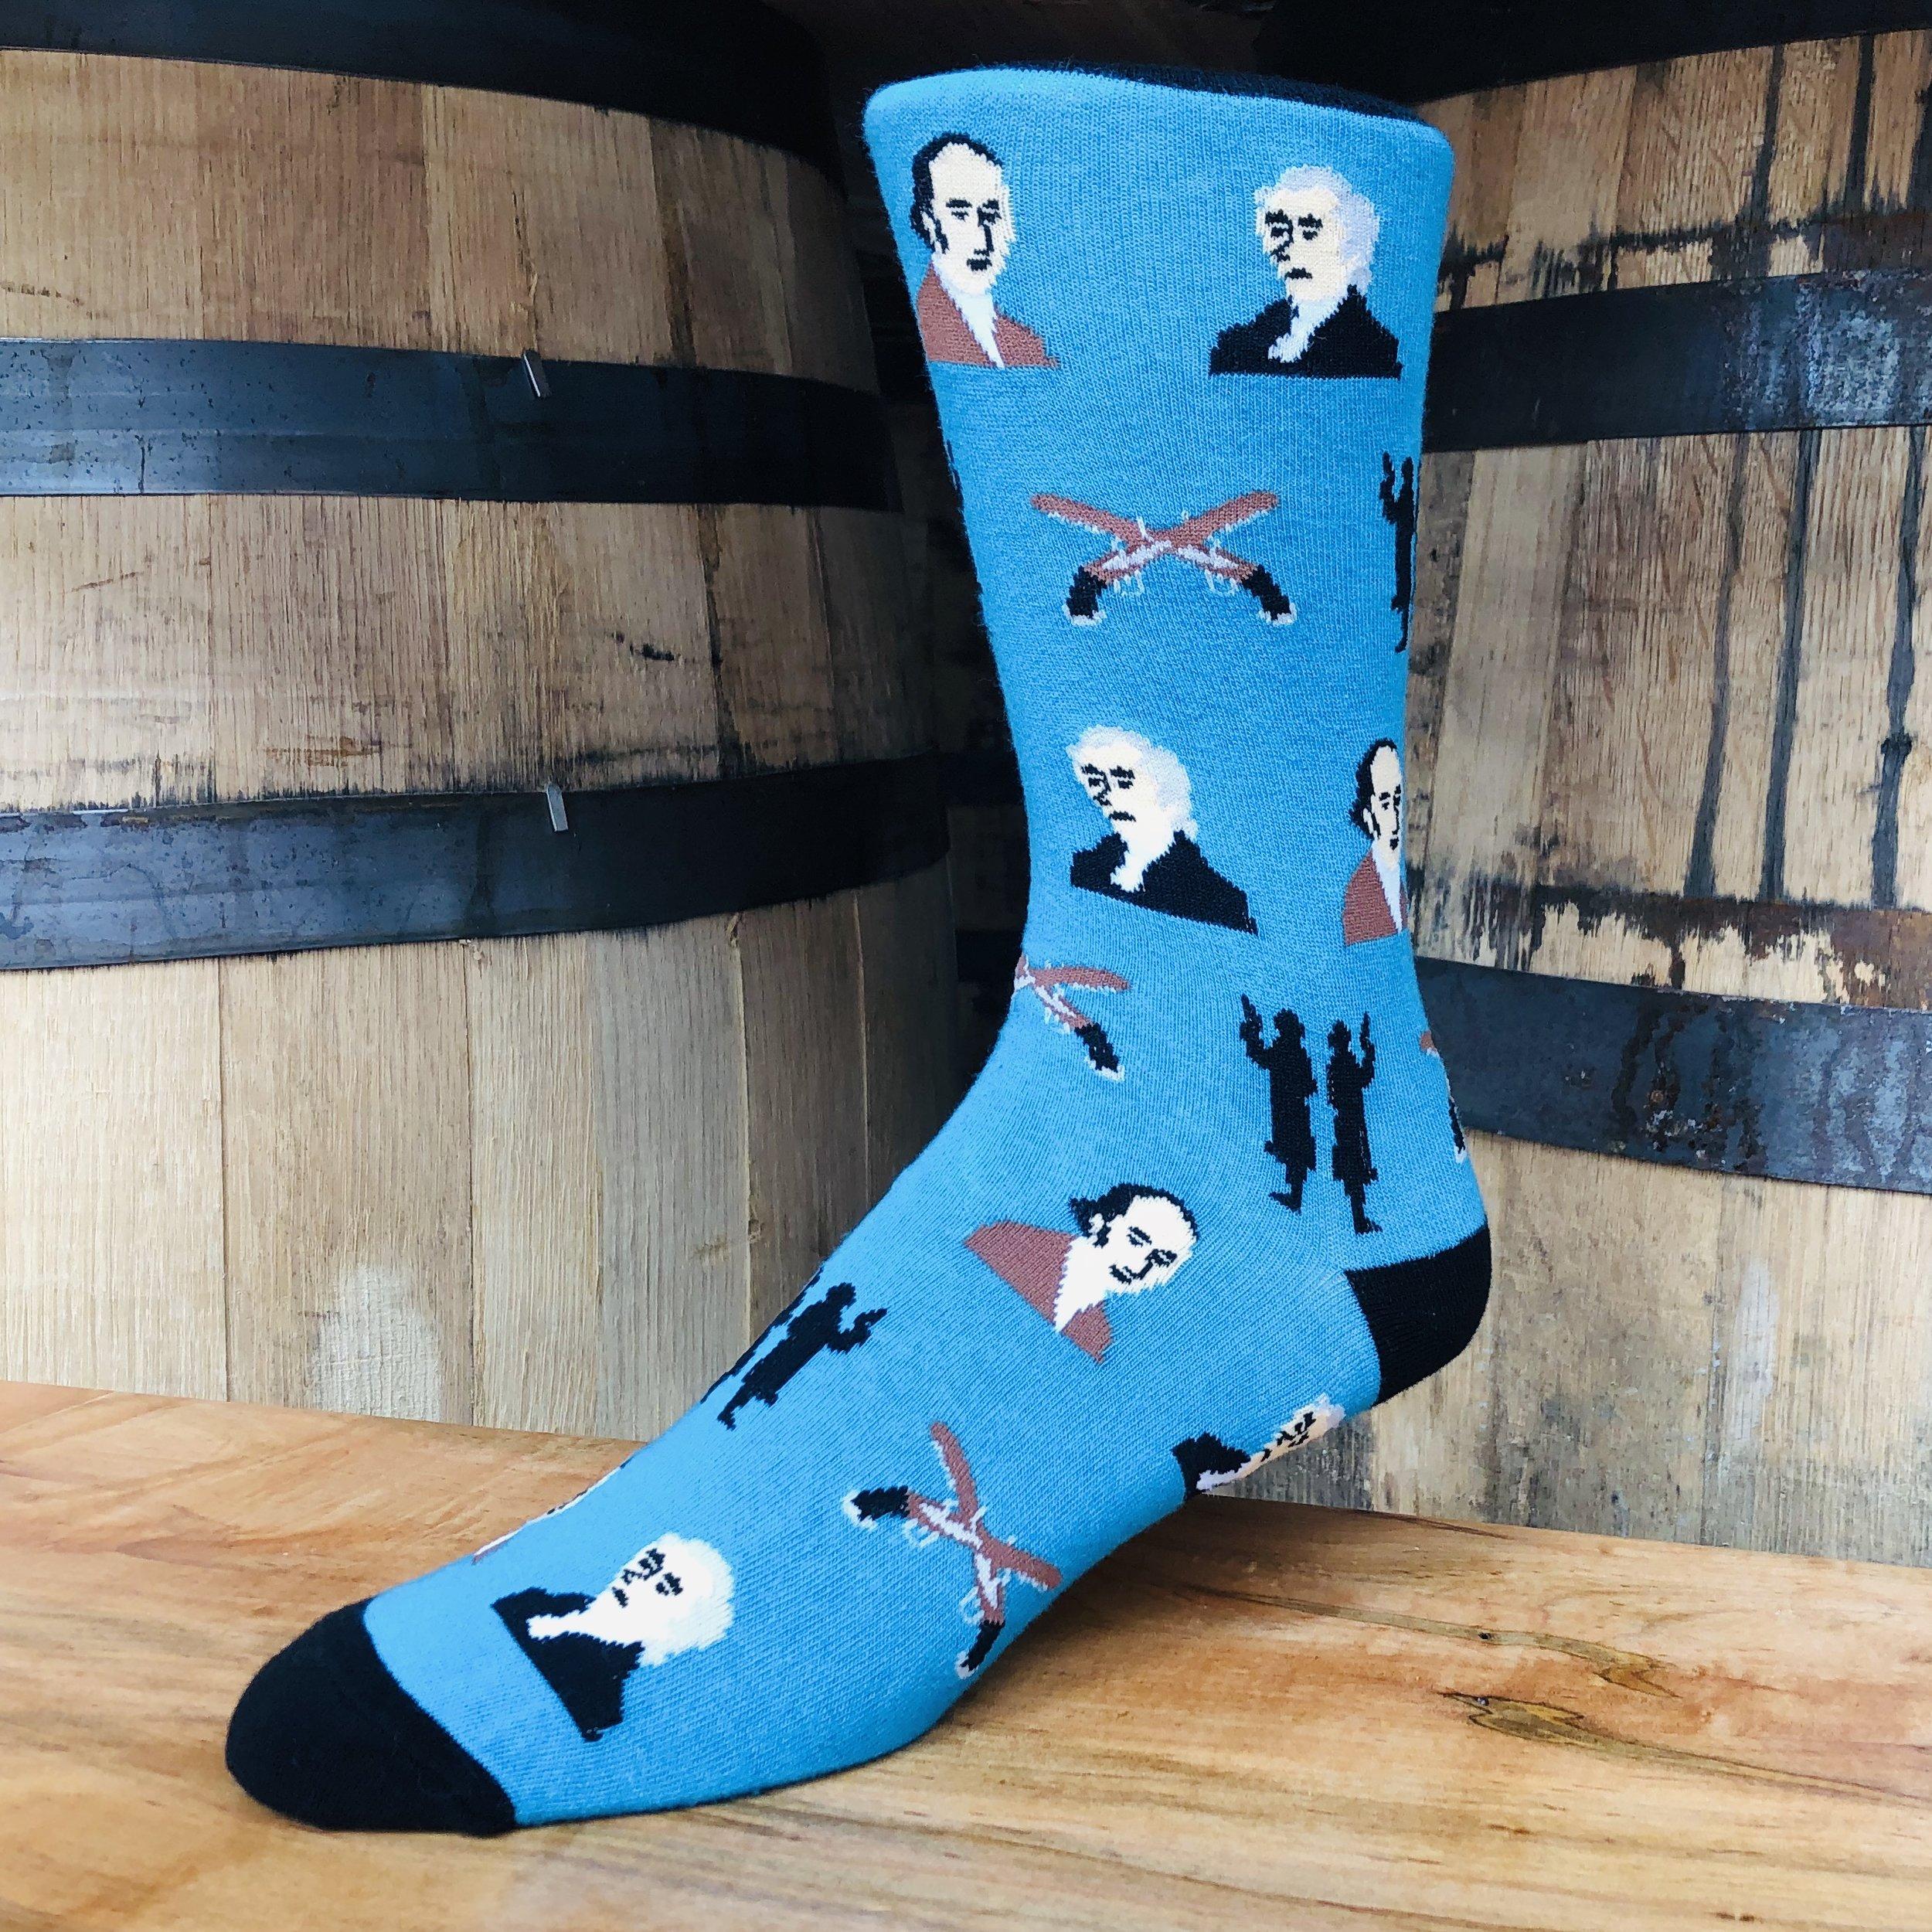 whats-hamilton-socks-01.jpg